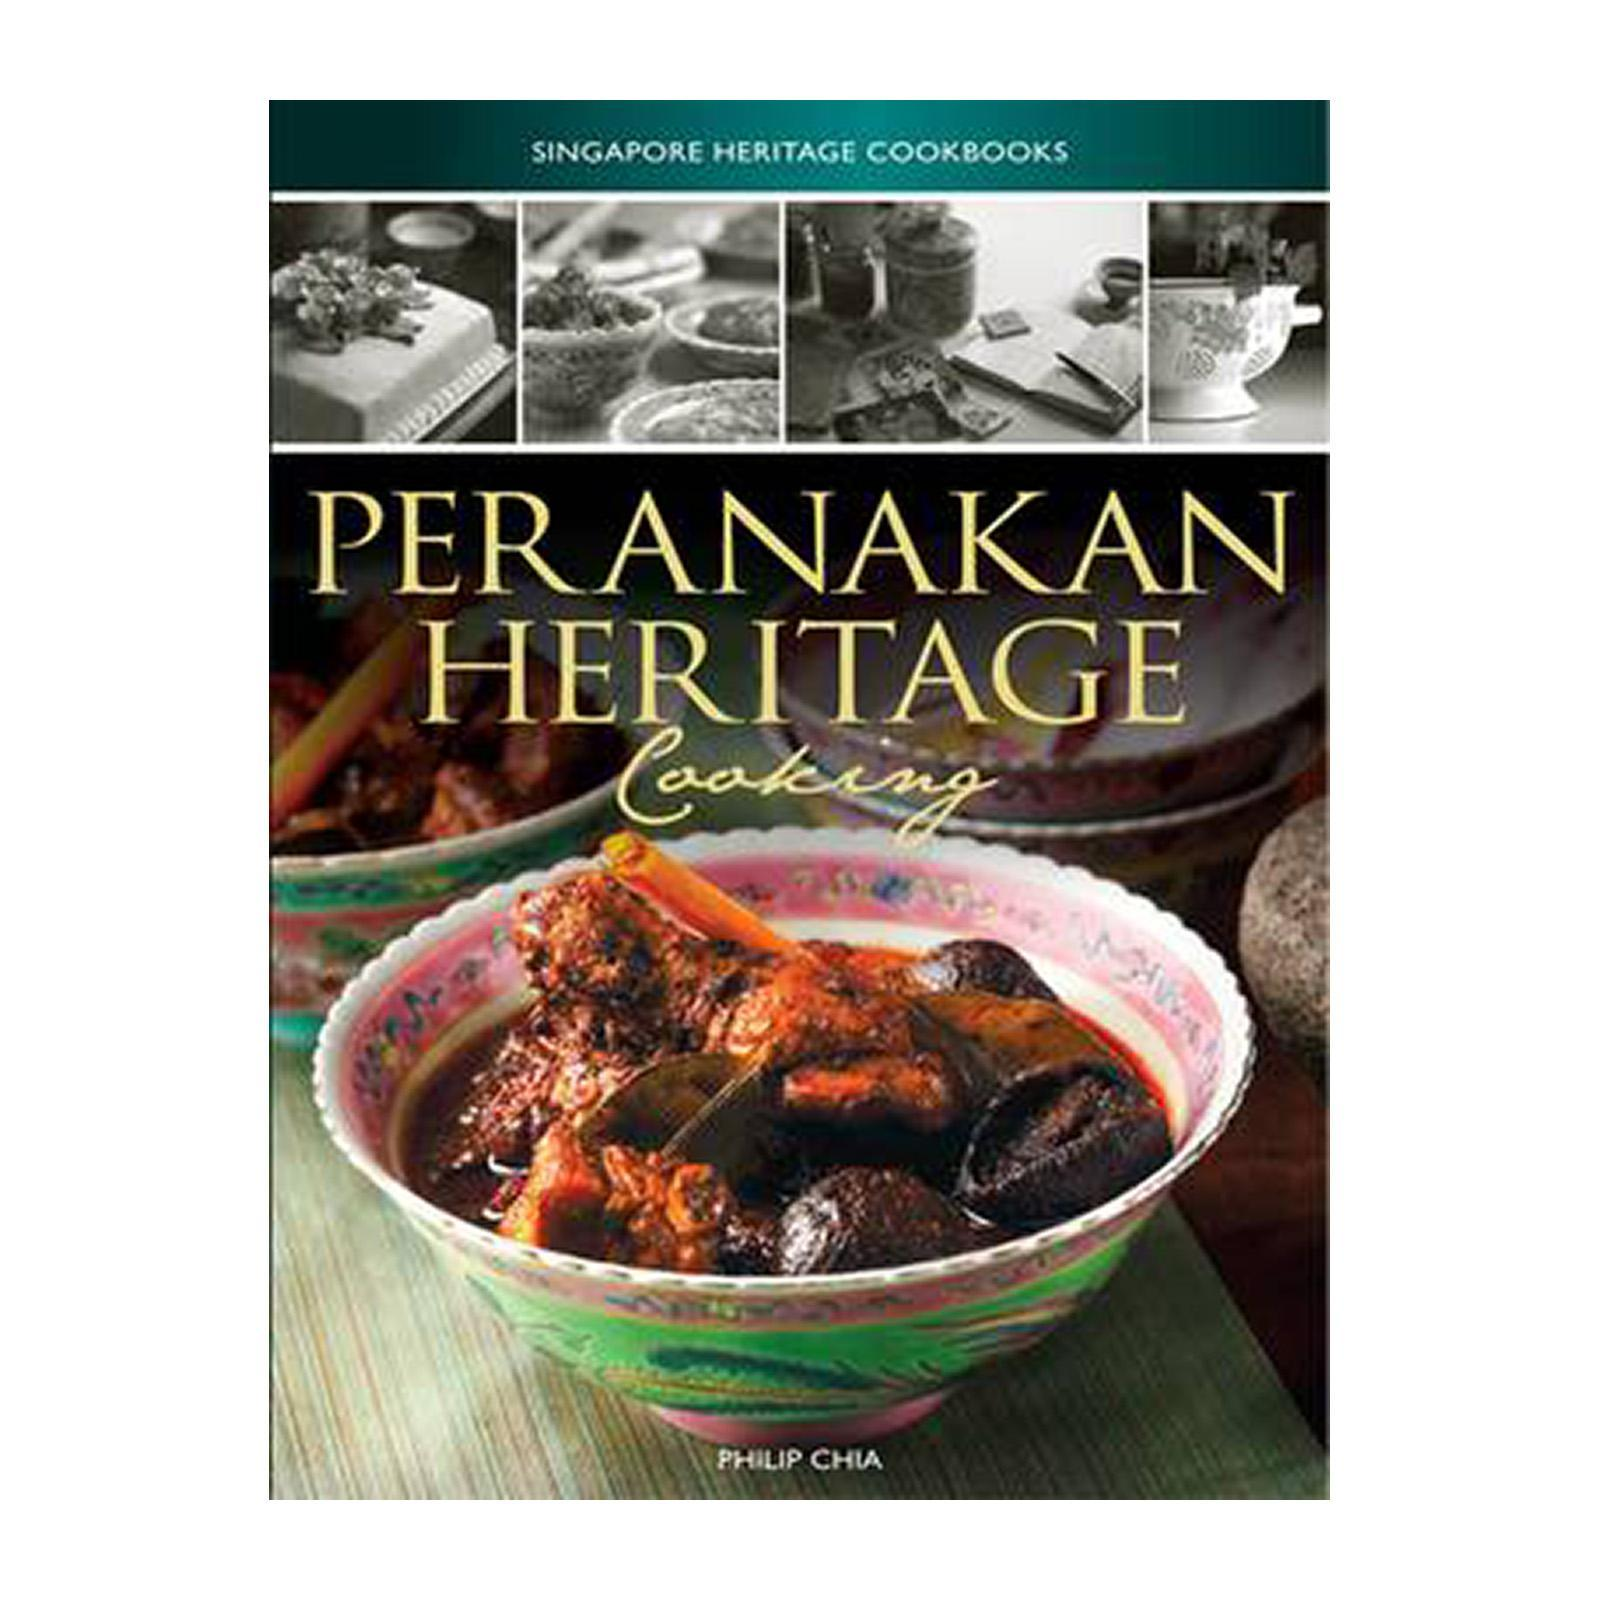 Singapore Heritage Cookbooks: Peranakan Heritage Cooking (Paperback)